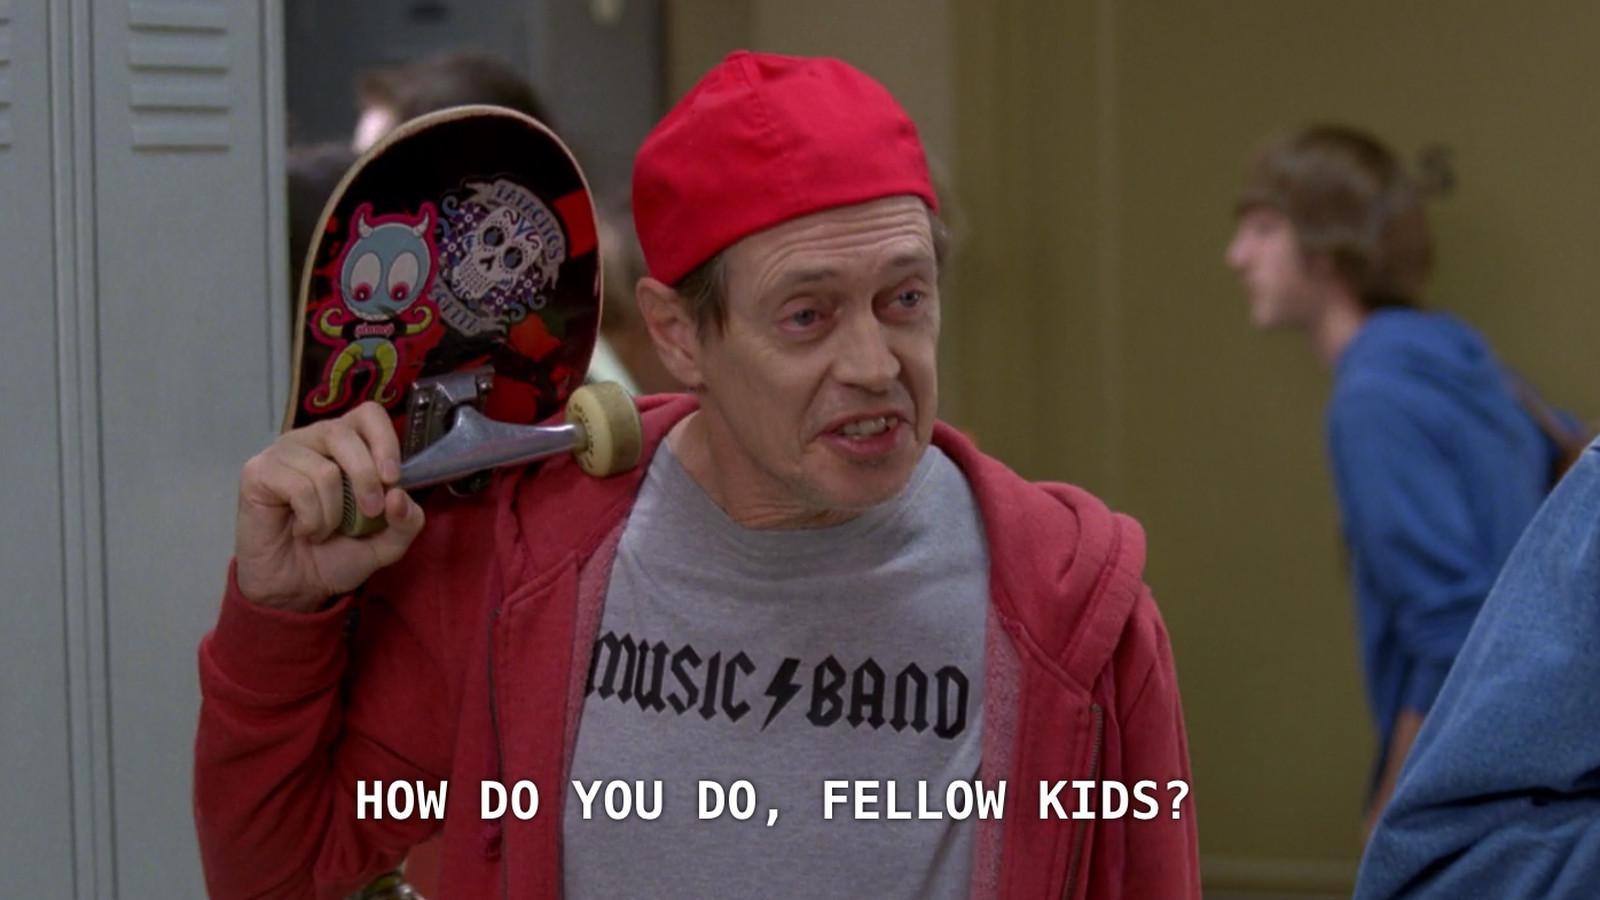 steve buscemi how do you do fellow kids meme 30 rock